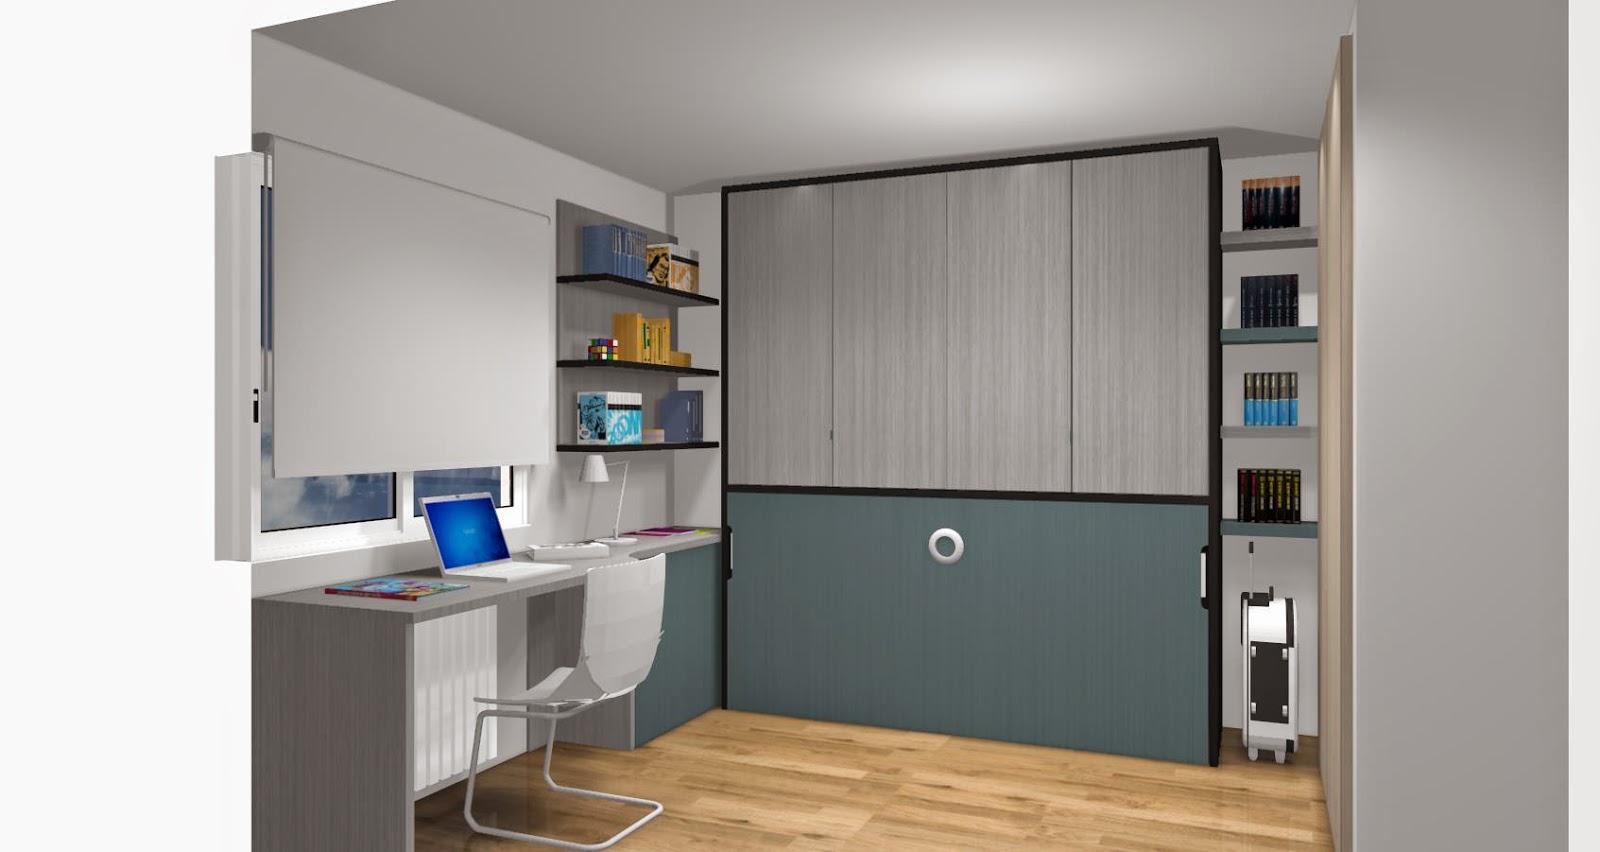 Dise o de cuartos o dormitorios juveniles - Habitaciones juveniles camas abatibles horizontales ...